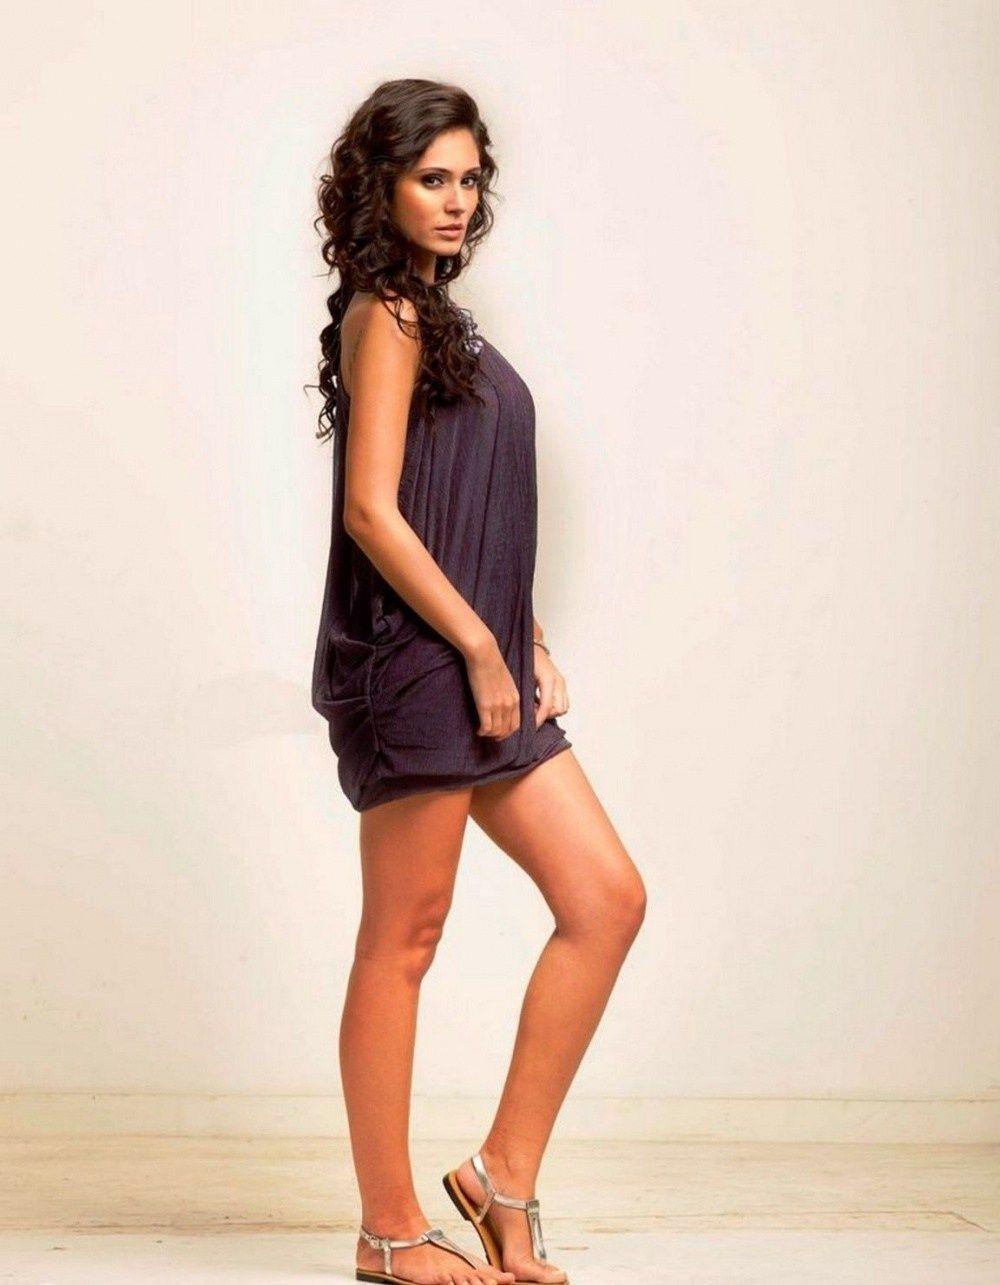 Bruna abdullah hot back bruna abdullah in short dress bruna abdullah - Bruna Abdullah Hot Pics In Purple Dress